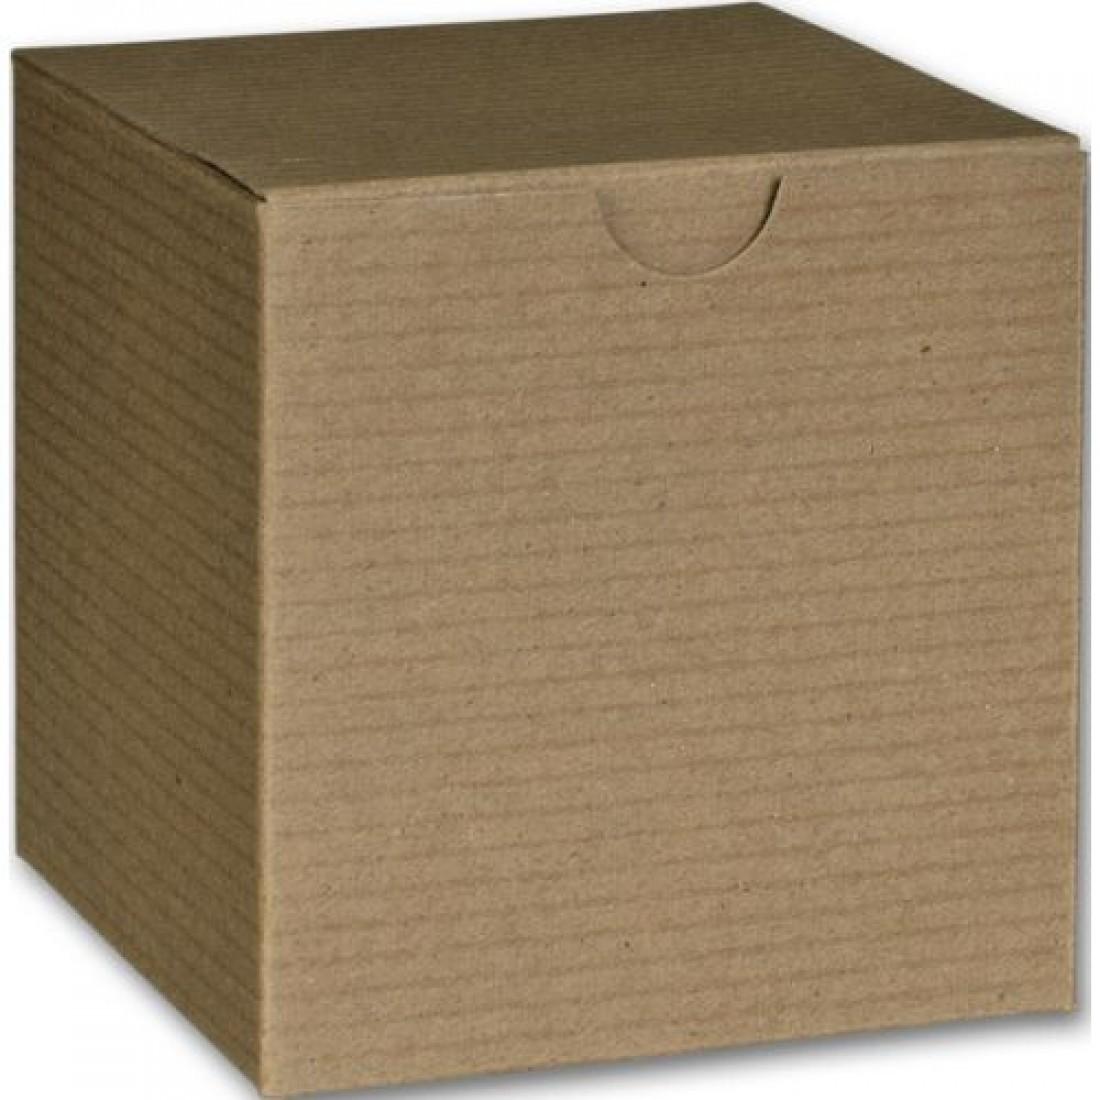 "Kraft 1PC Gift Box 4x4x4"""